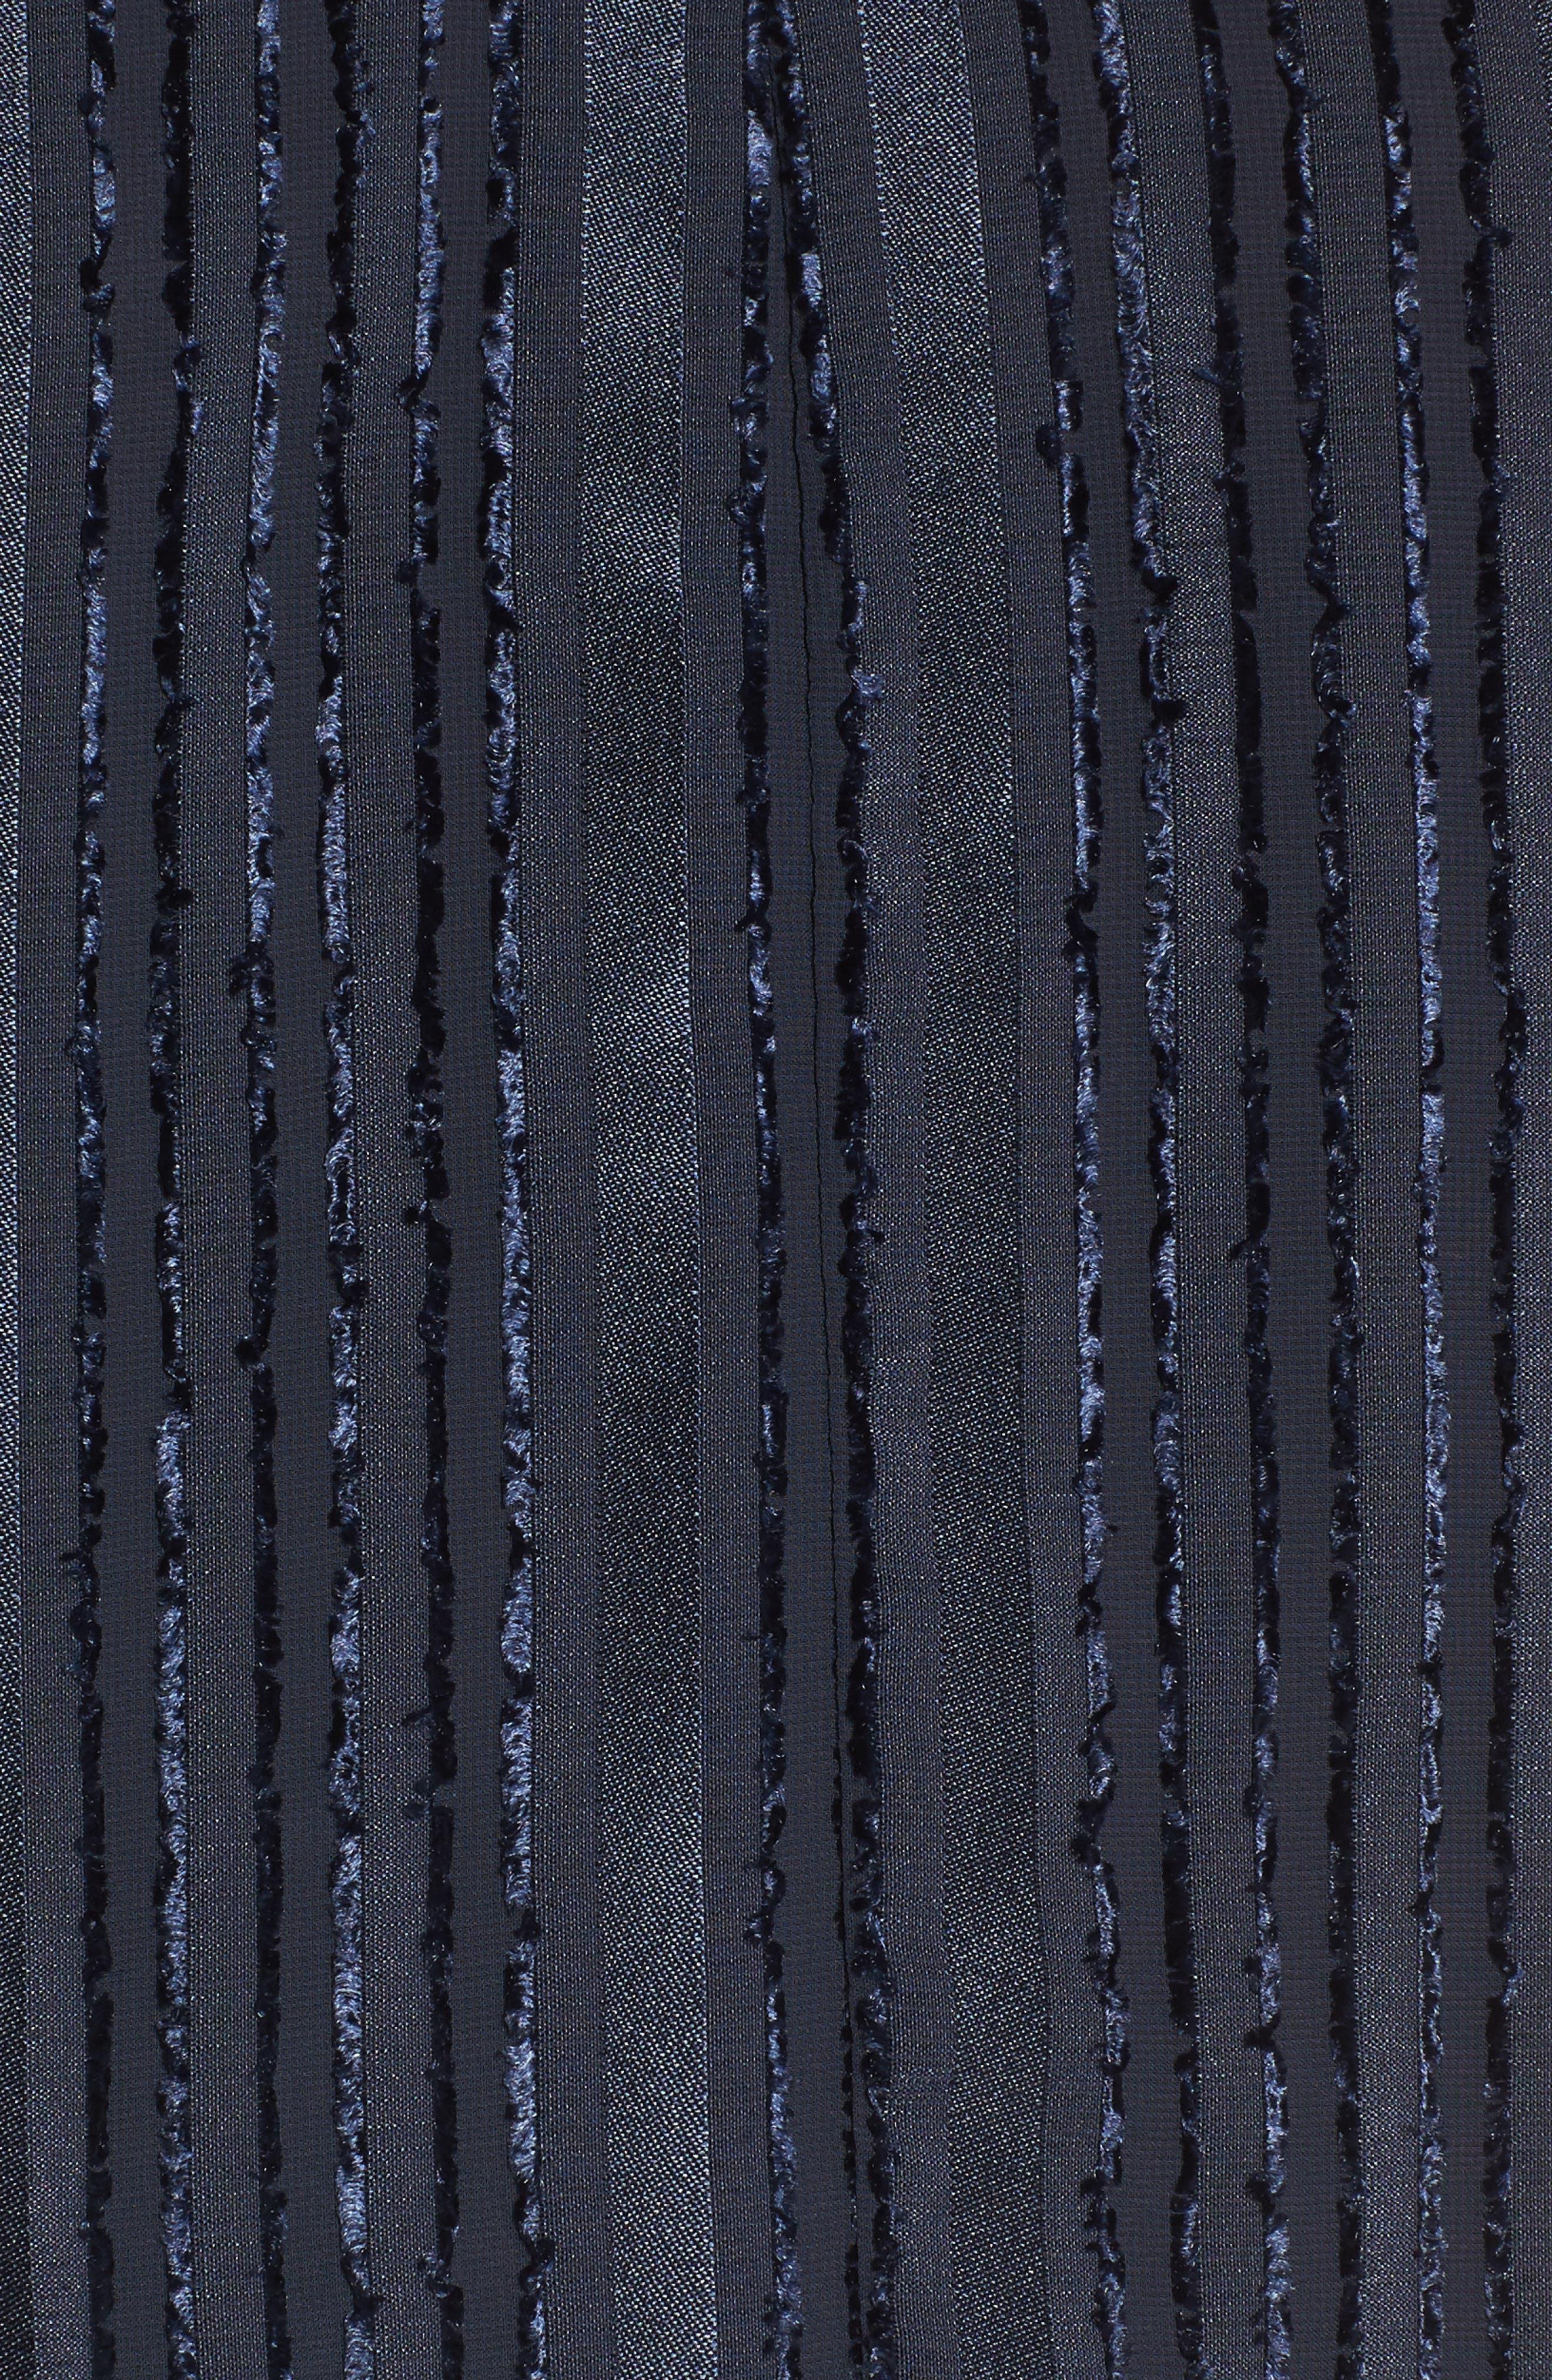 Raquel Bell Sleeve Blouse,                             Alternate thumbnail 5, color,                             400